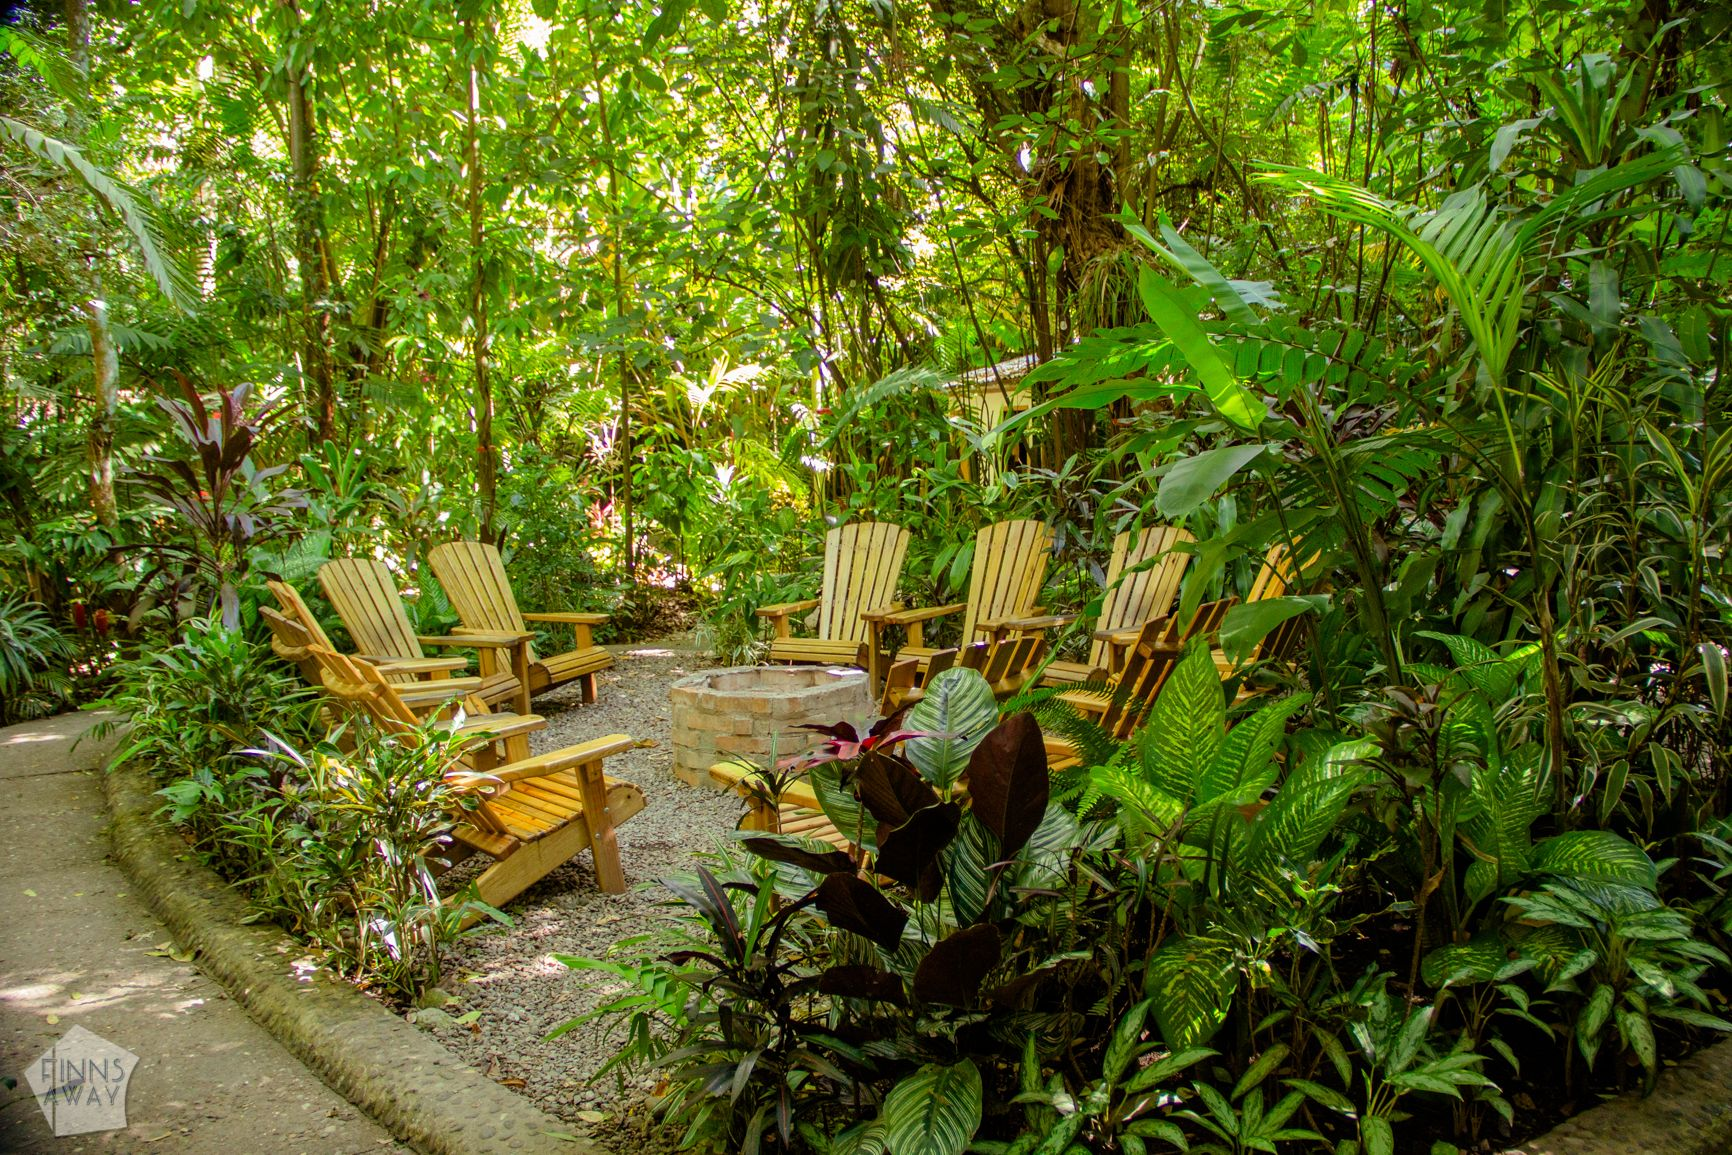 D&D Brewery & Lodge | Lago de Yojoa Lake, Honduras | FinnsAway Travel Blog